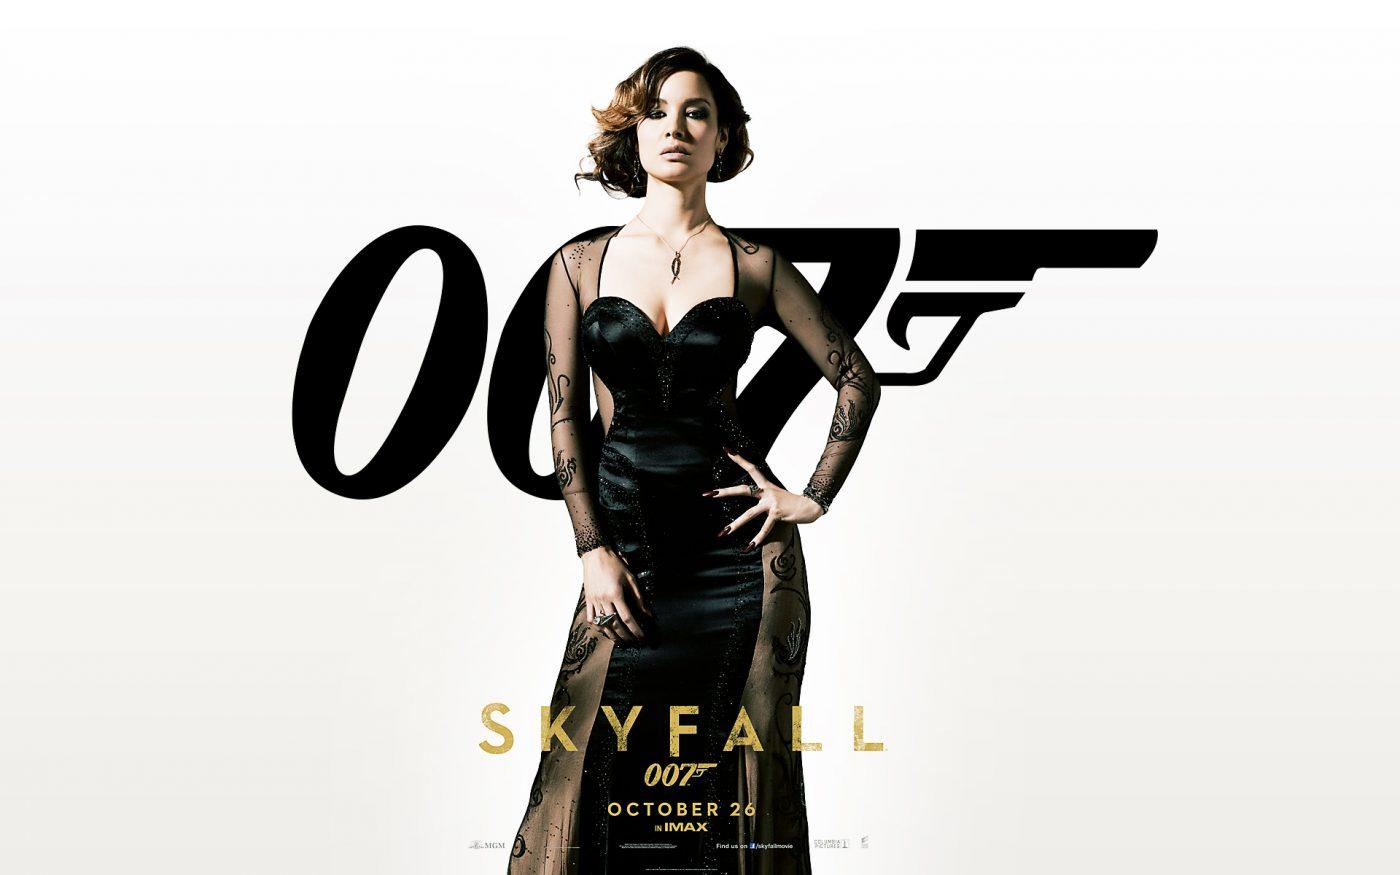 Berenice Marlohe Skyfall Dress GET THE SKYFALL LOOK HOW TO